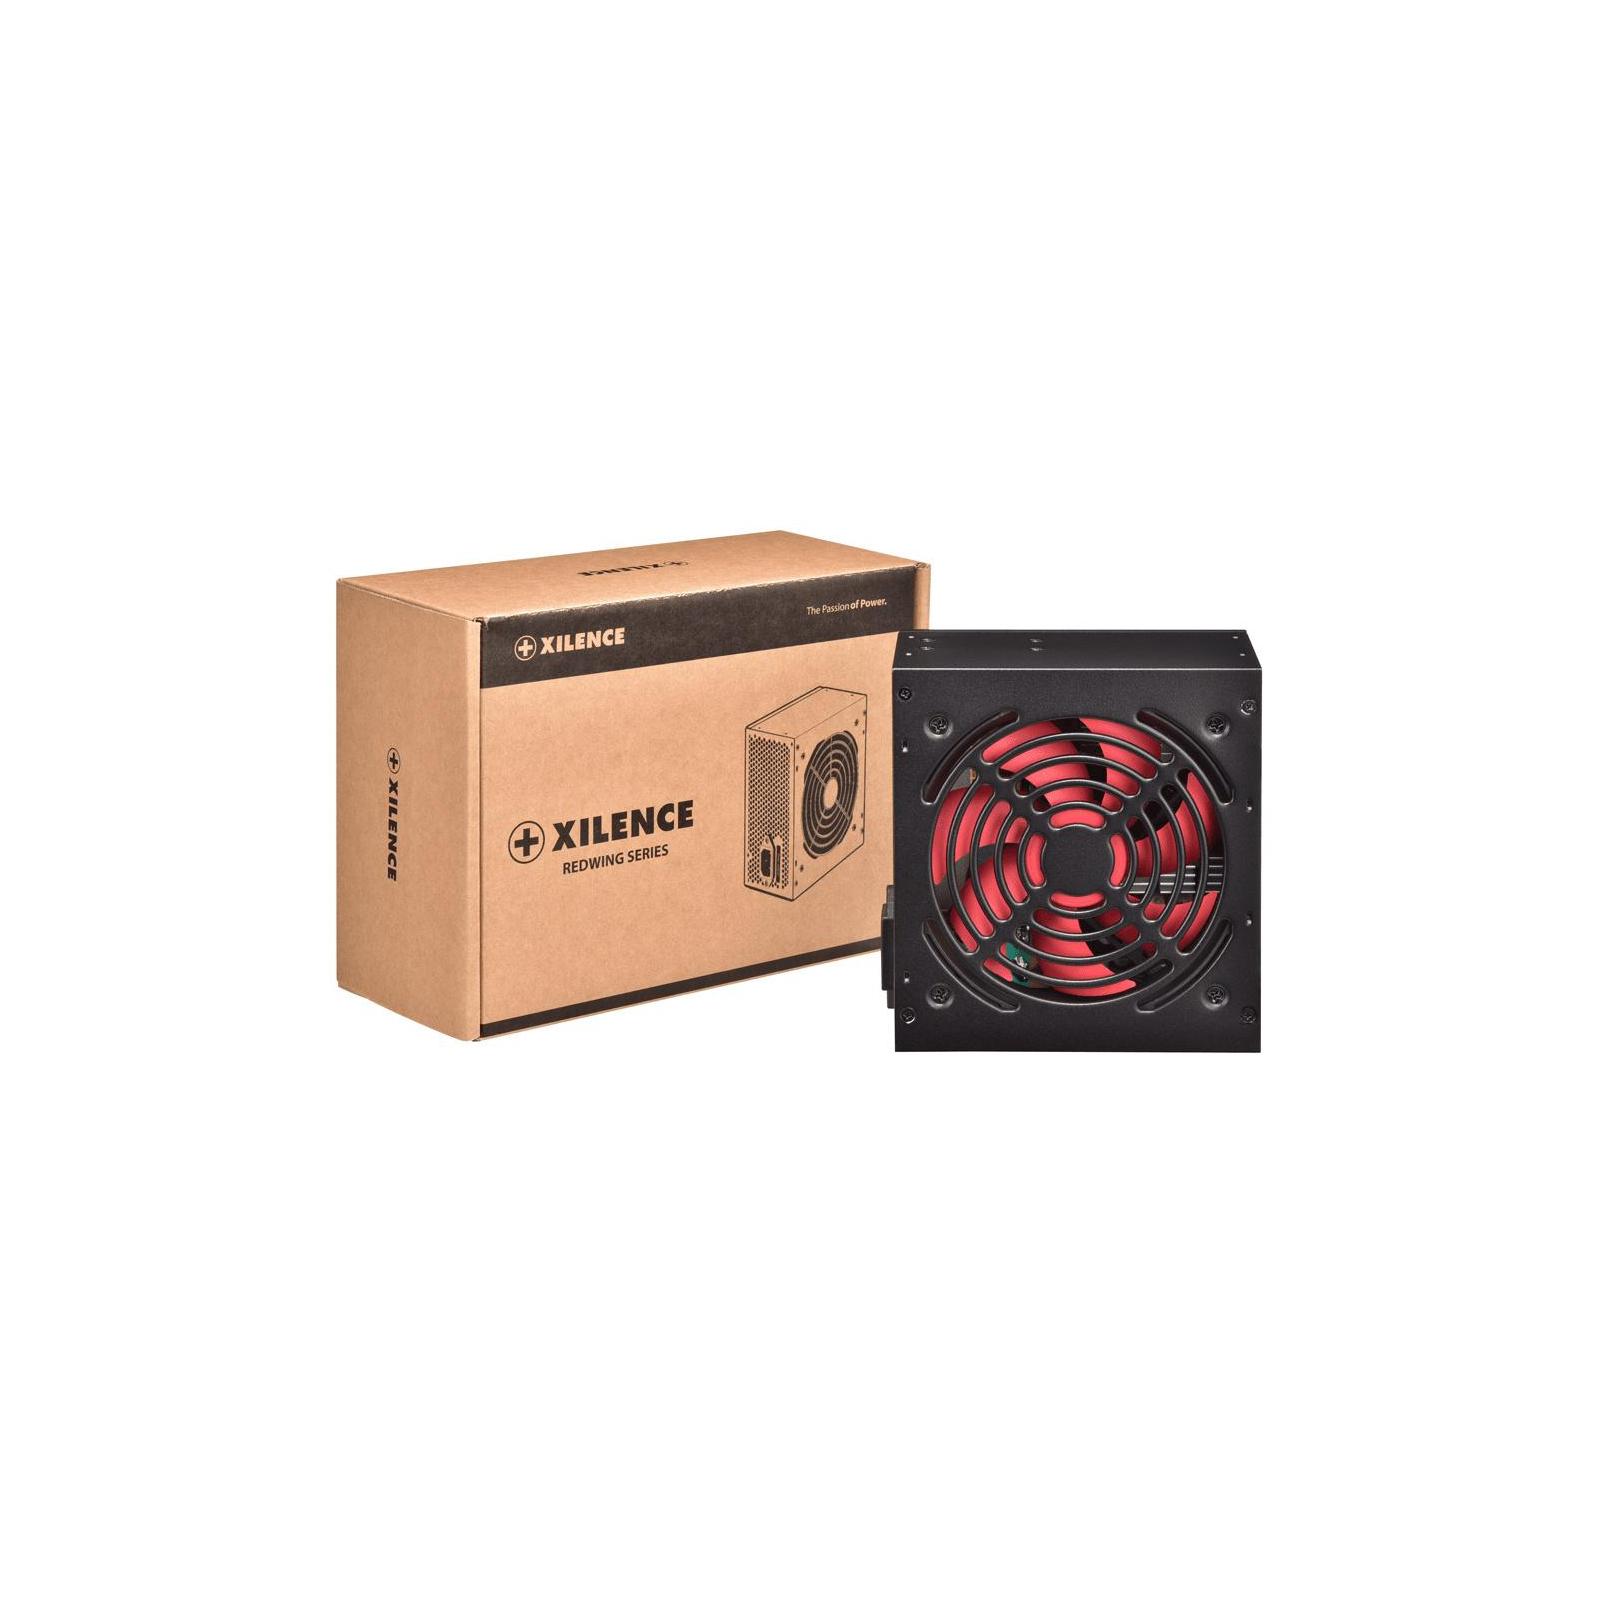 Блок питания Xilence 700W (XP700R7) изображение 3